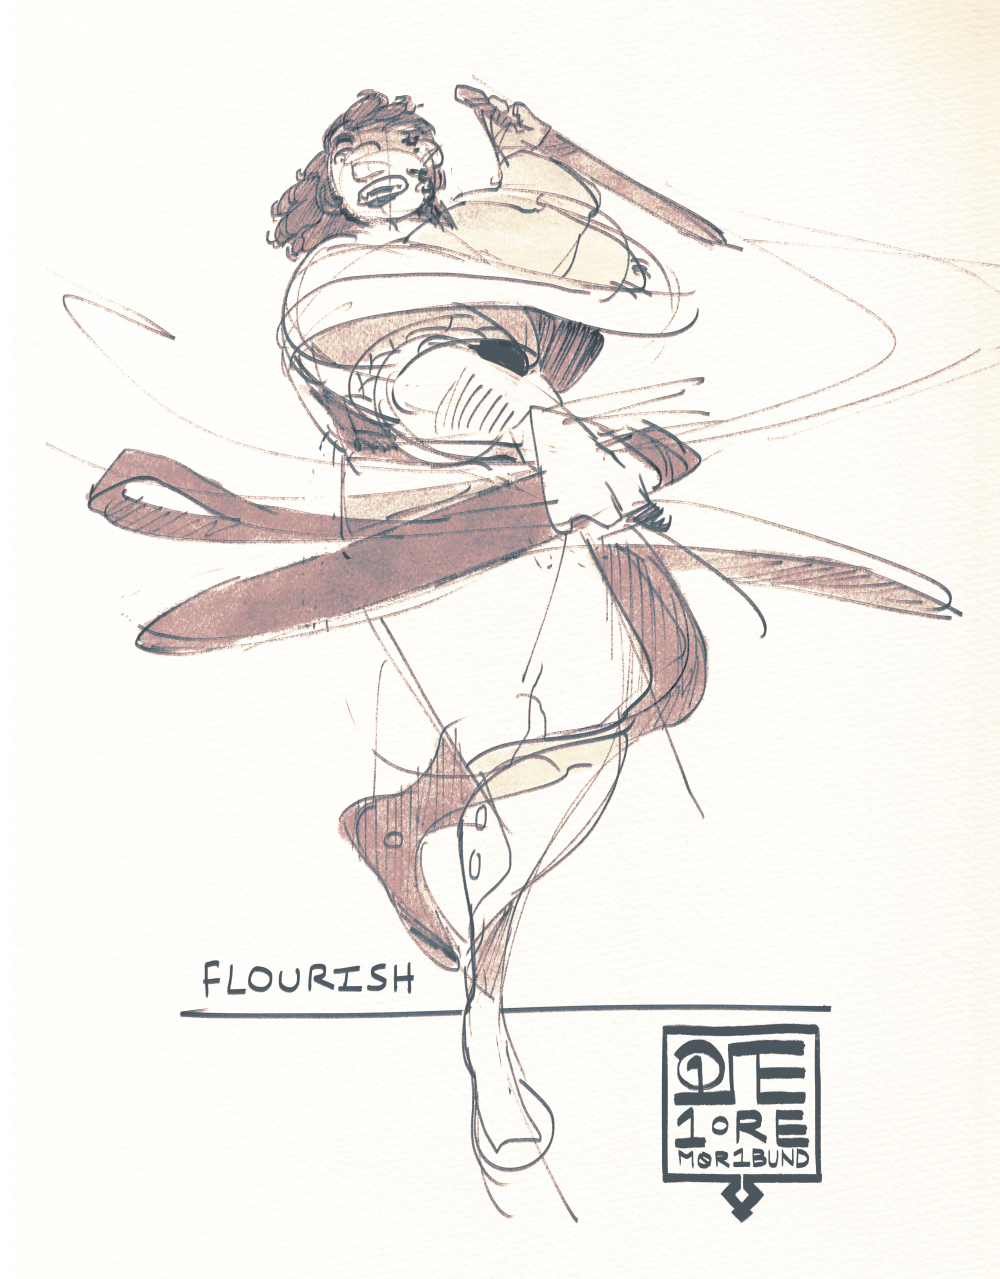 Flourish page 1